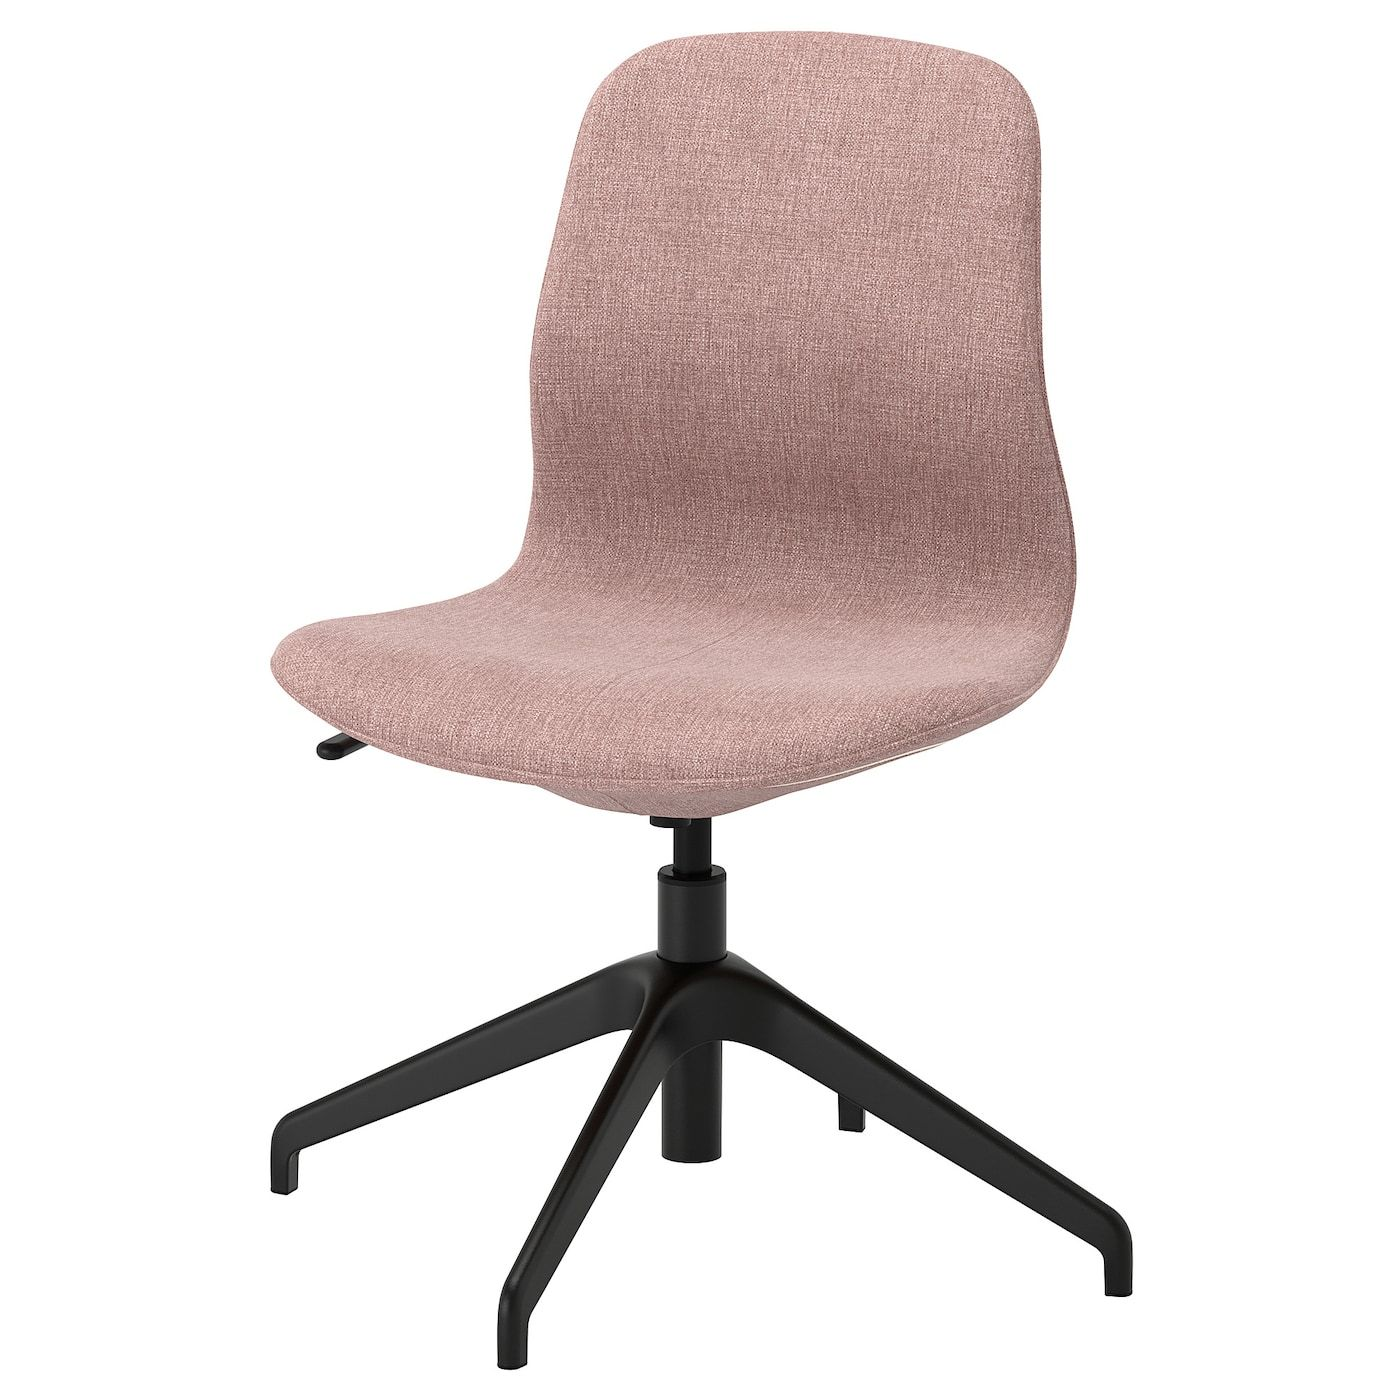 Langfjall Vergaderstoel Gunnared Oudroze Winkel Vandaag Ikea Kantoorstoel Bureaustoel Kantoor Behang